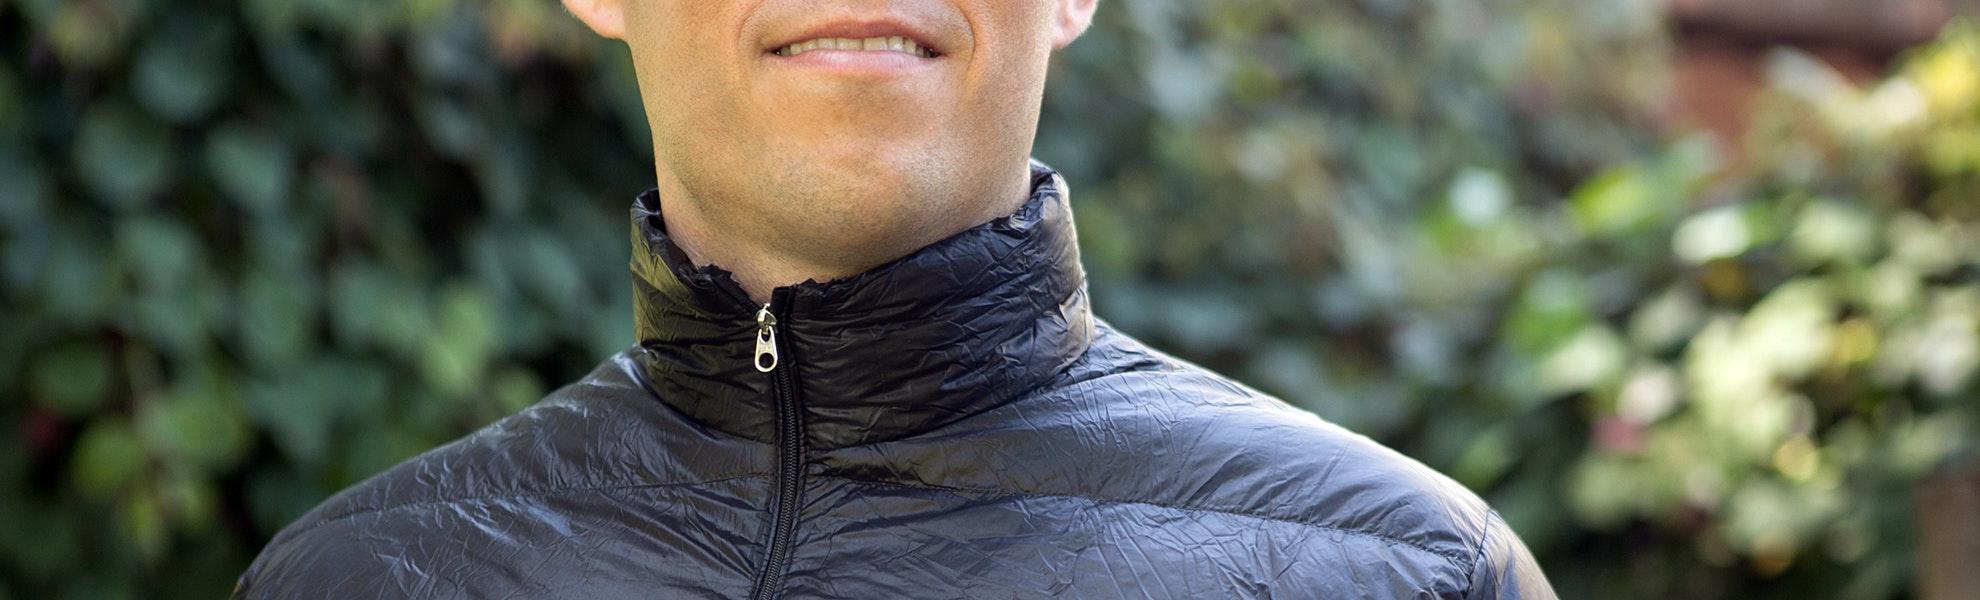 Borah Gear Down Jacket